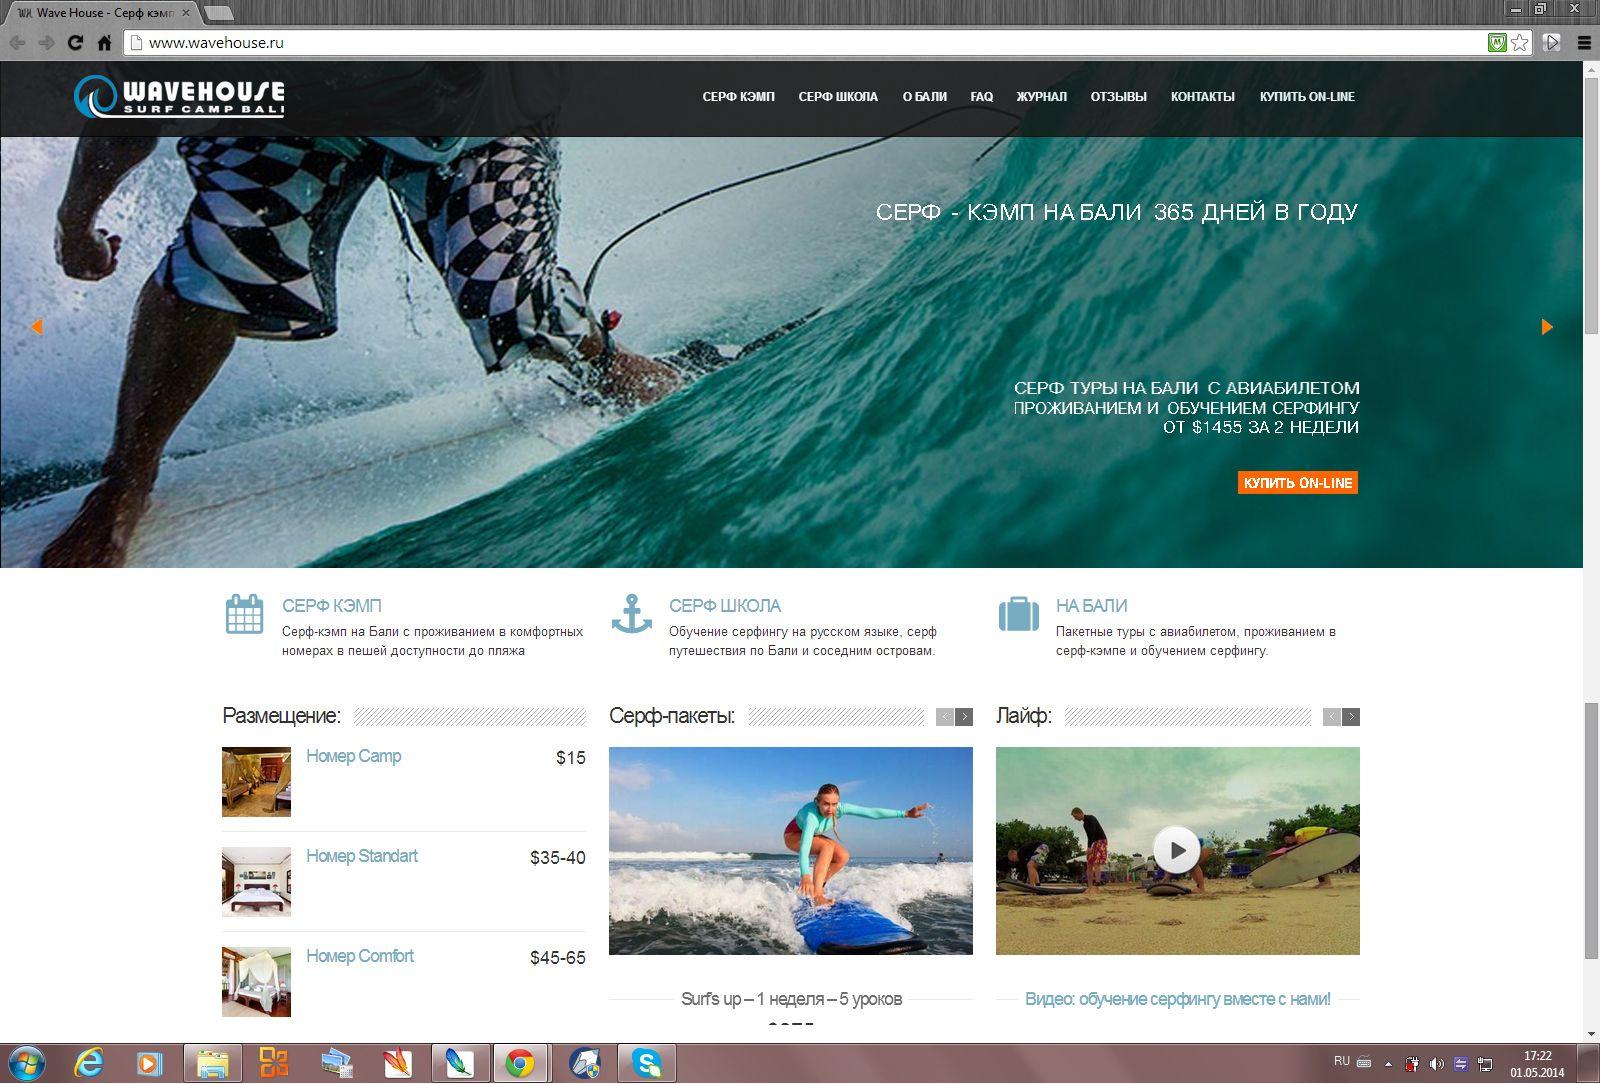 Редизайн логотипа для серф-кэмпа на Бали - дизайнер jovanny